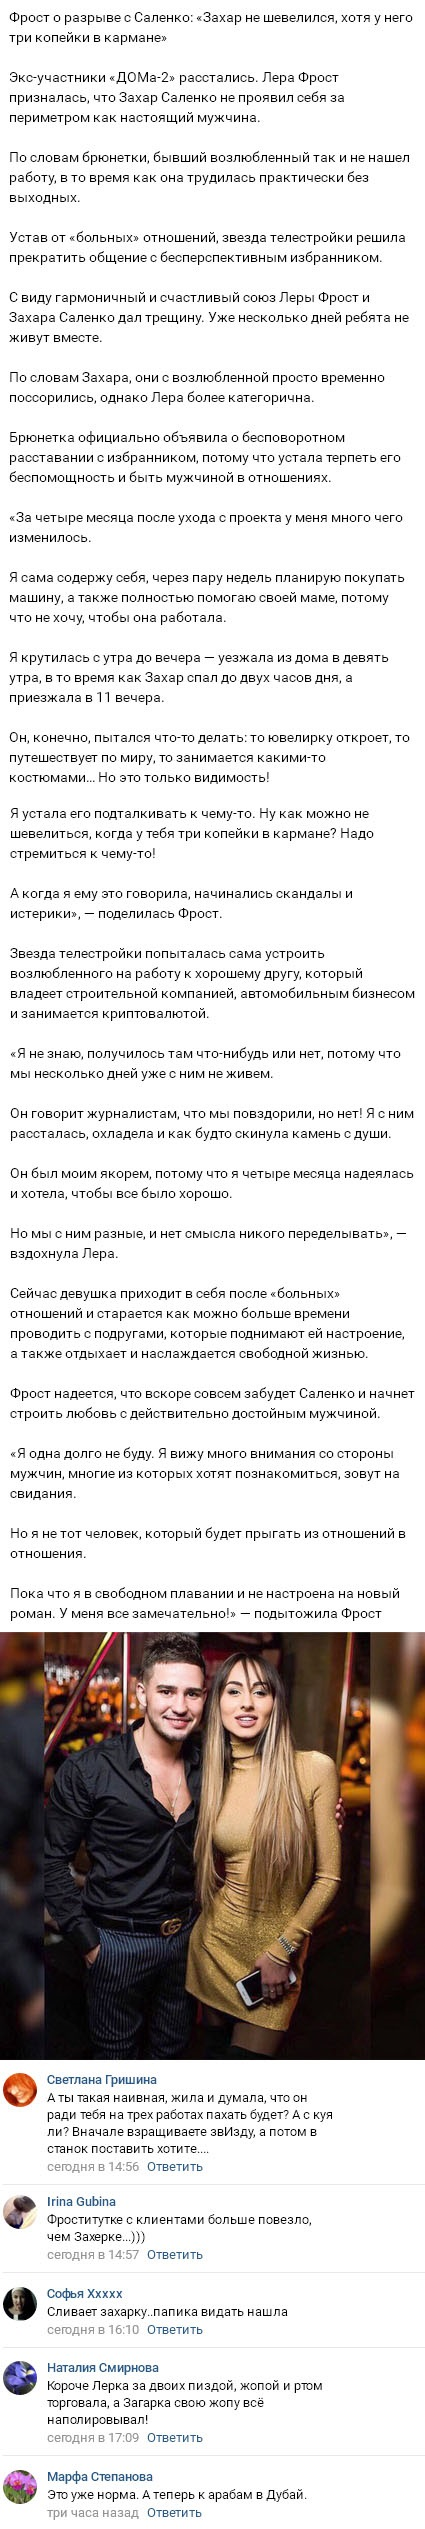 Валерия Фрост и Захар Саленко огорчили поклонников плохими новостями